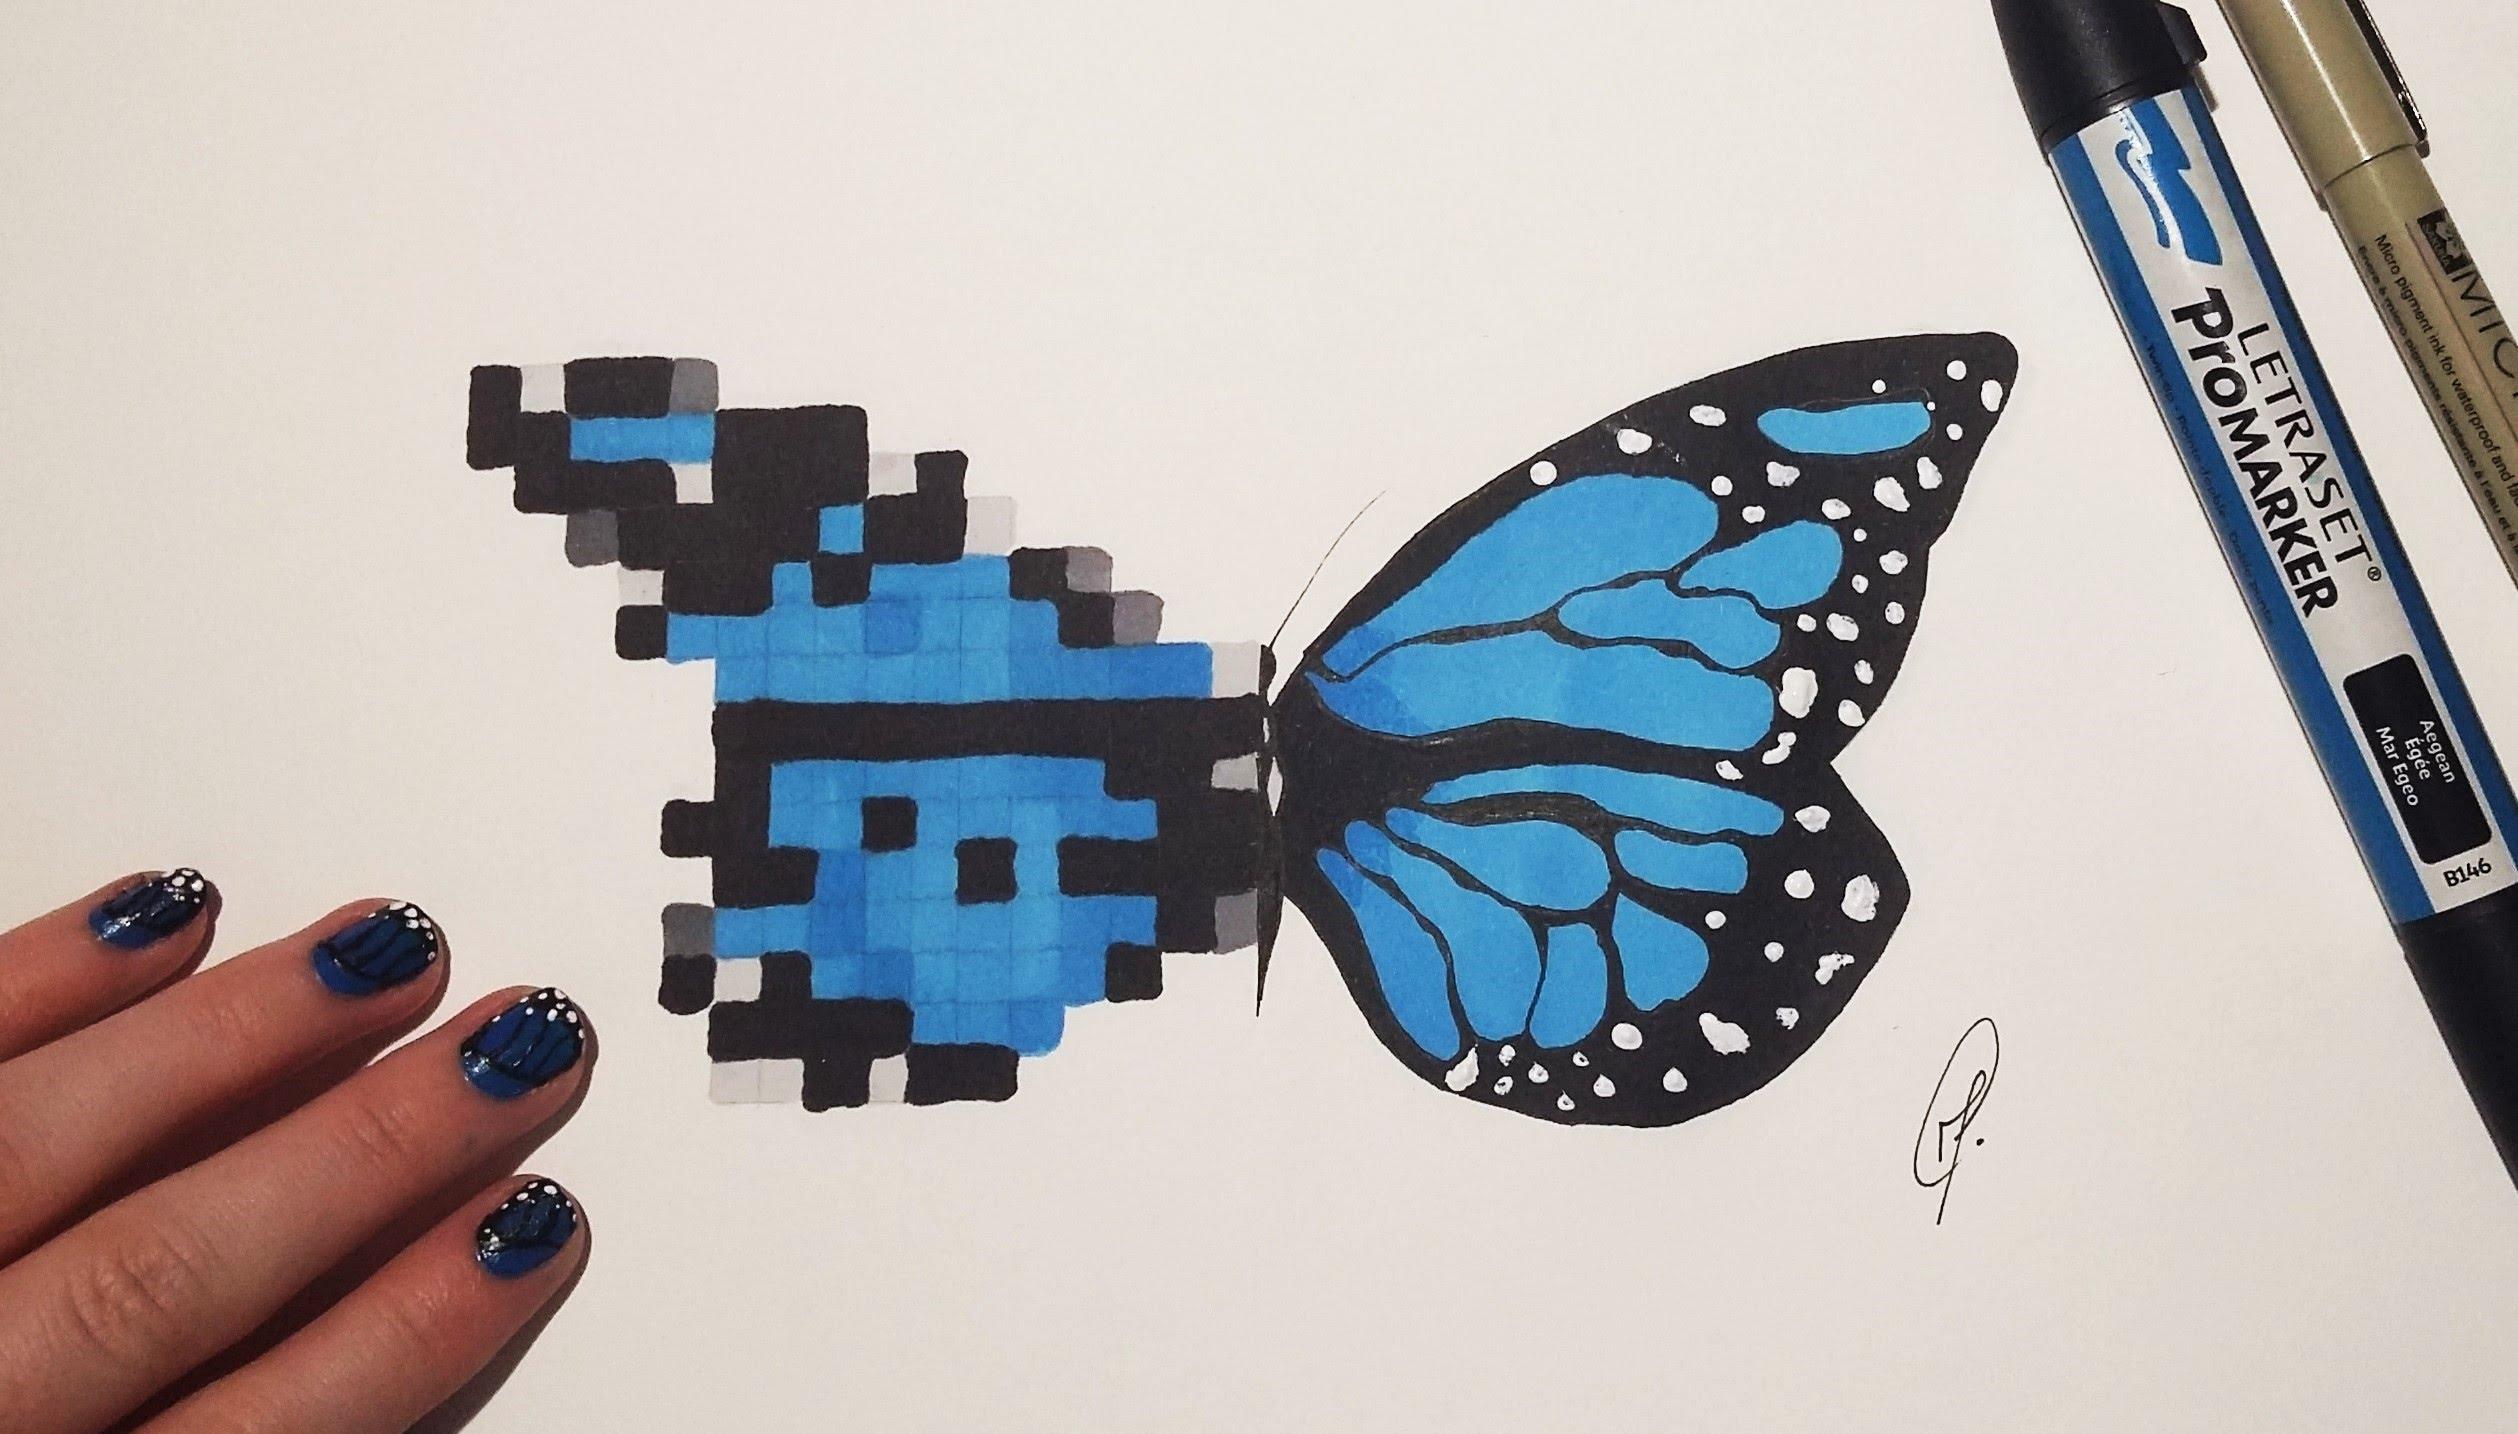 Drawn pixel art realistic Pixel & Drawing Fantasy Butterfly